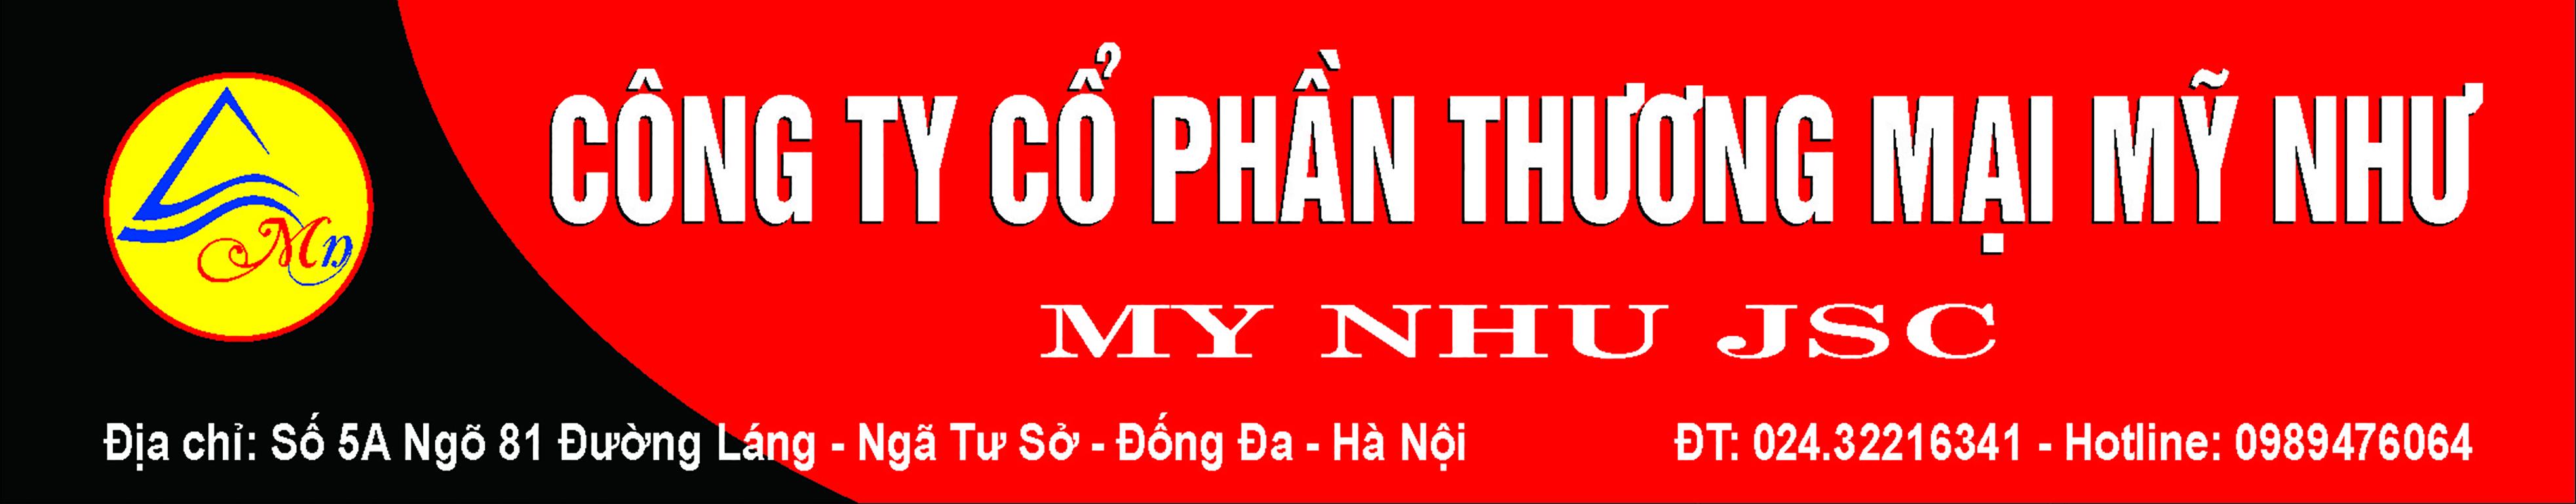 Mynhu.com